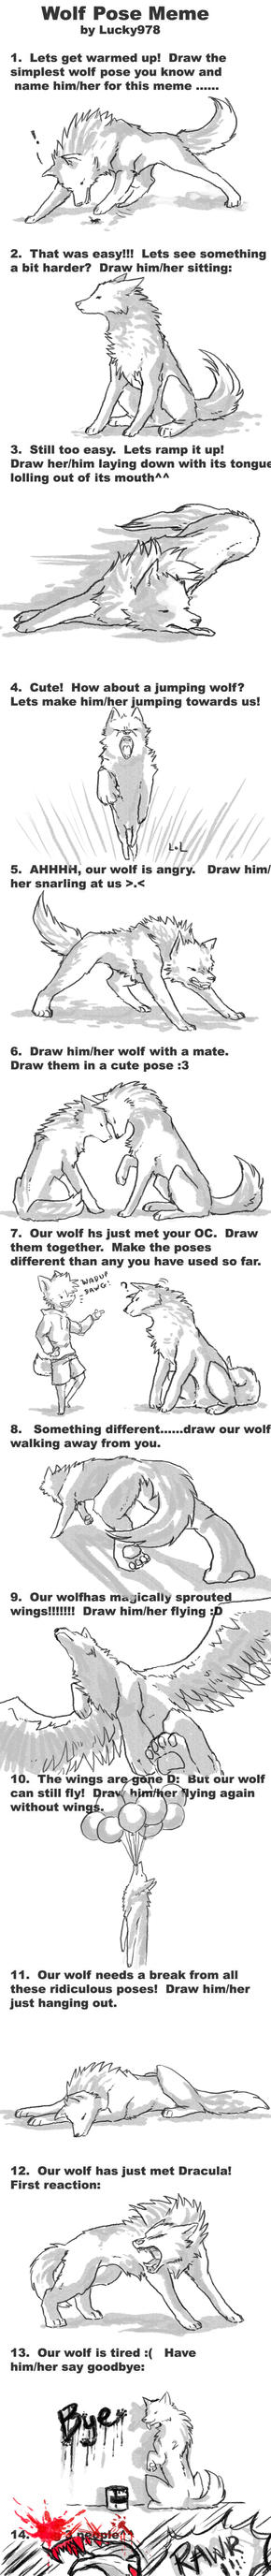 Wolf Pose Meme by ByoWT1125